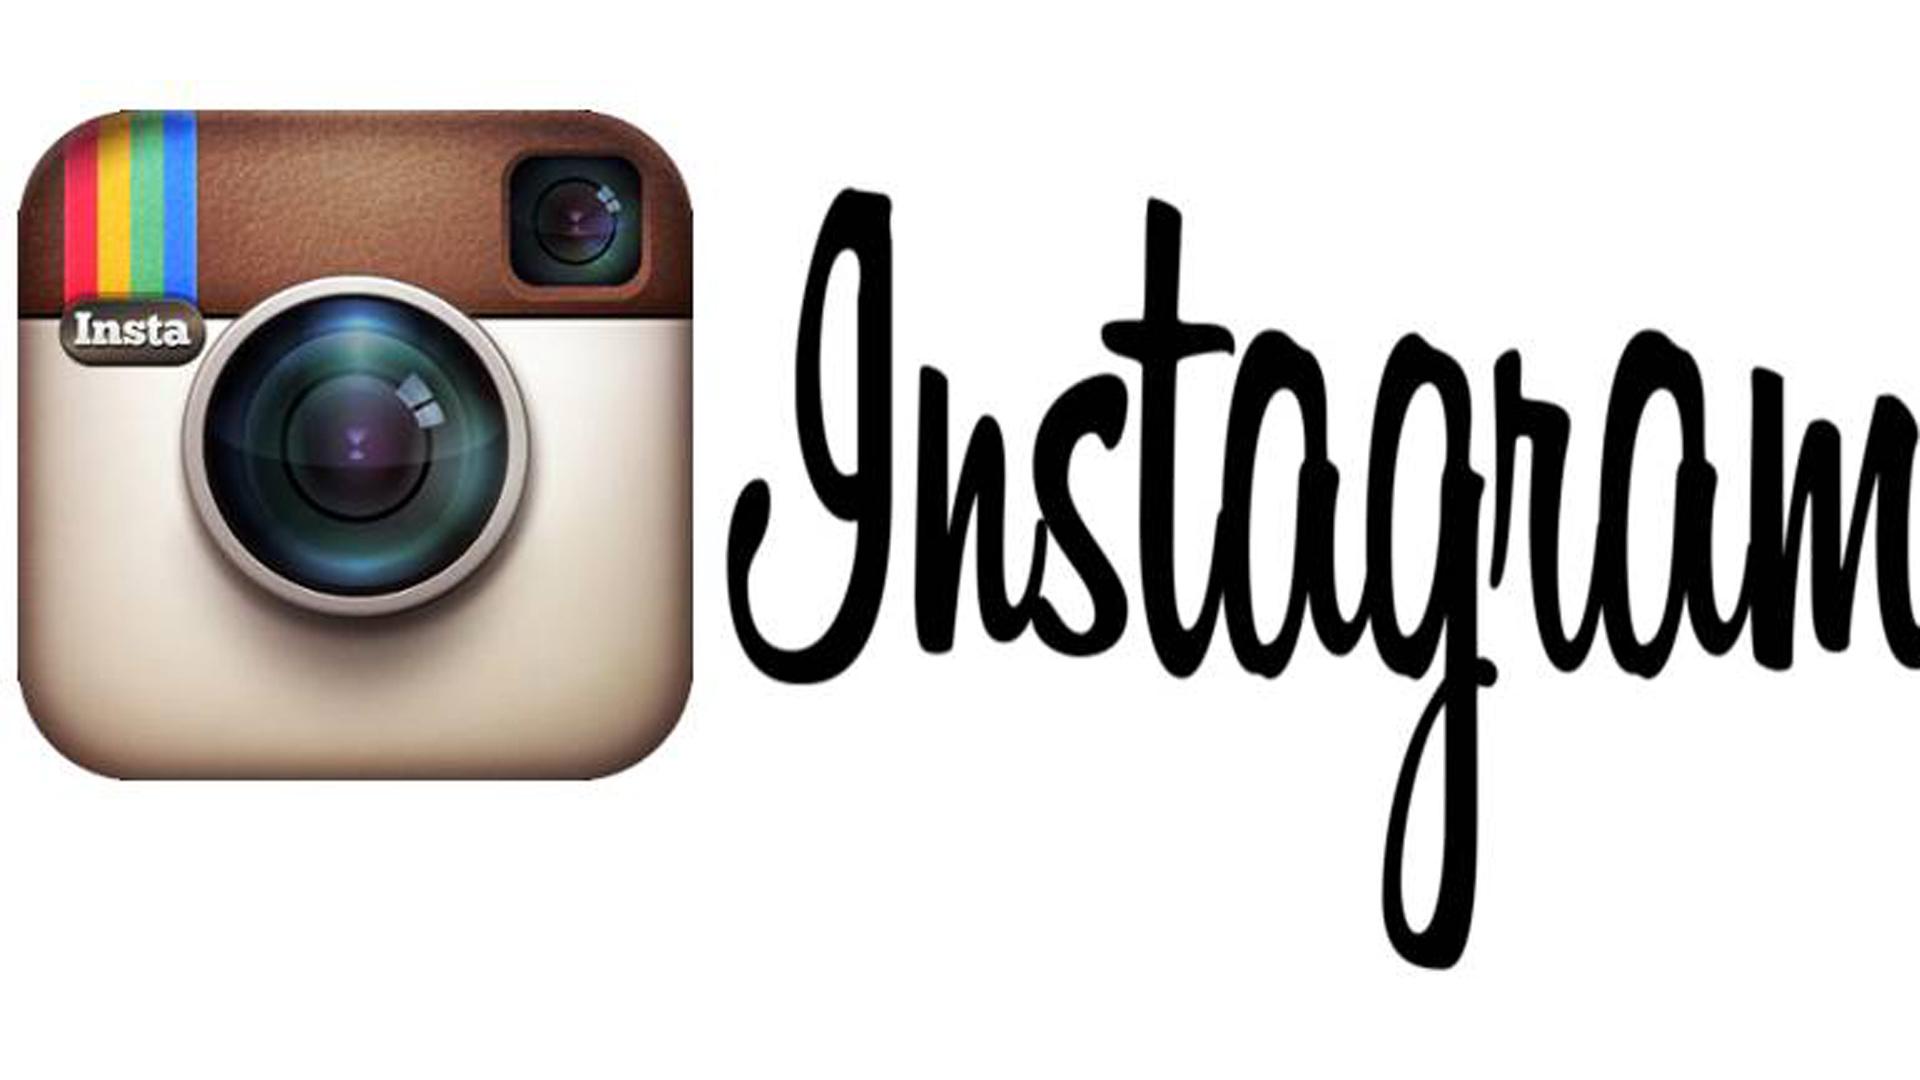 Instagram Logo Wallpaper